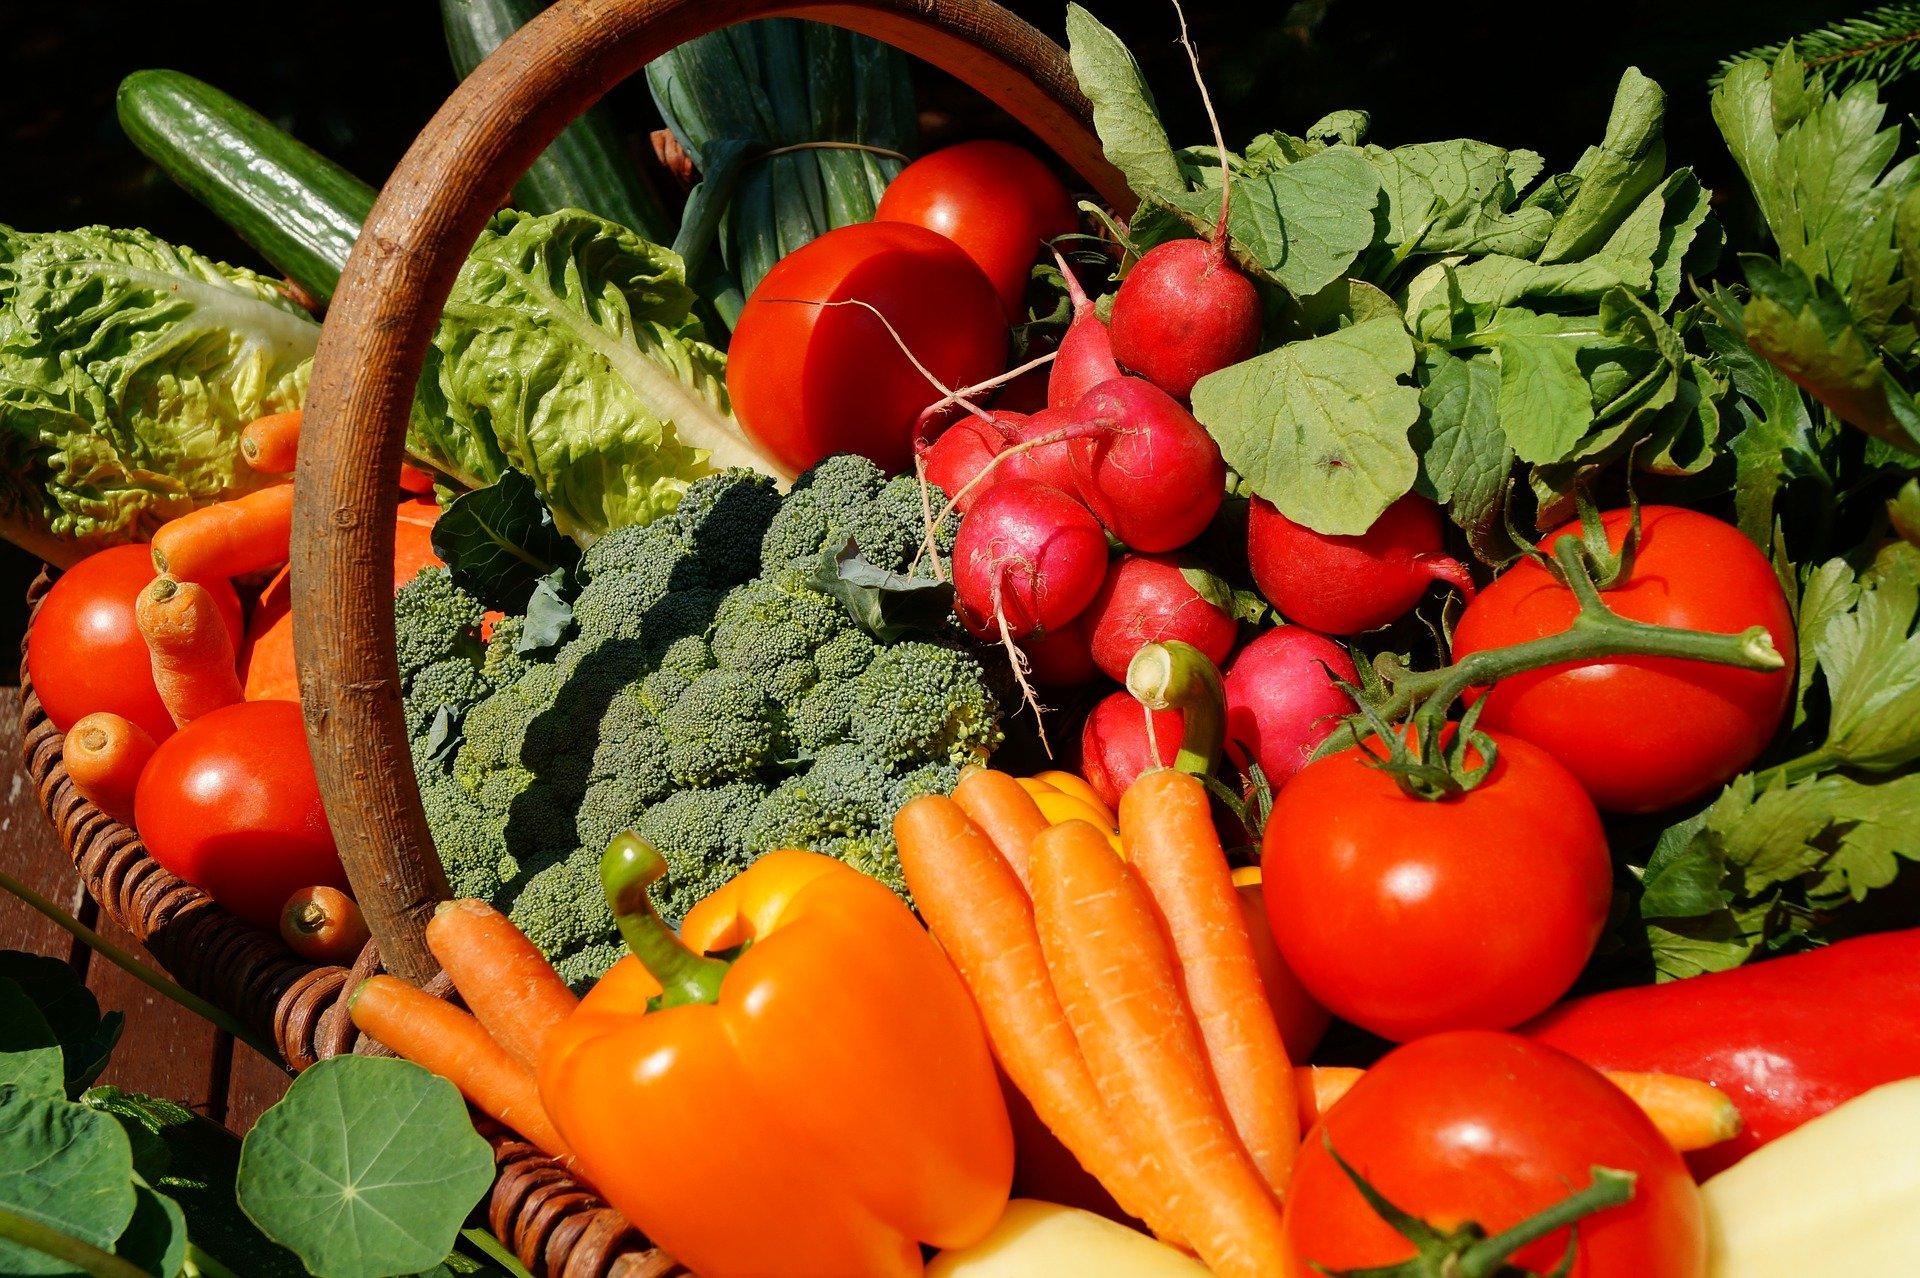 https://www.proinfoandadvice.com/wp-content/uploads/2021/02/vegetables-3386212_1920-1.jpg